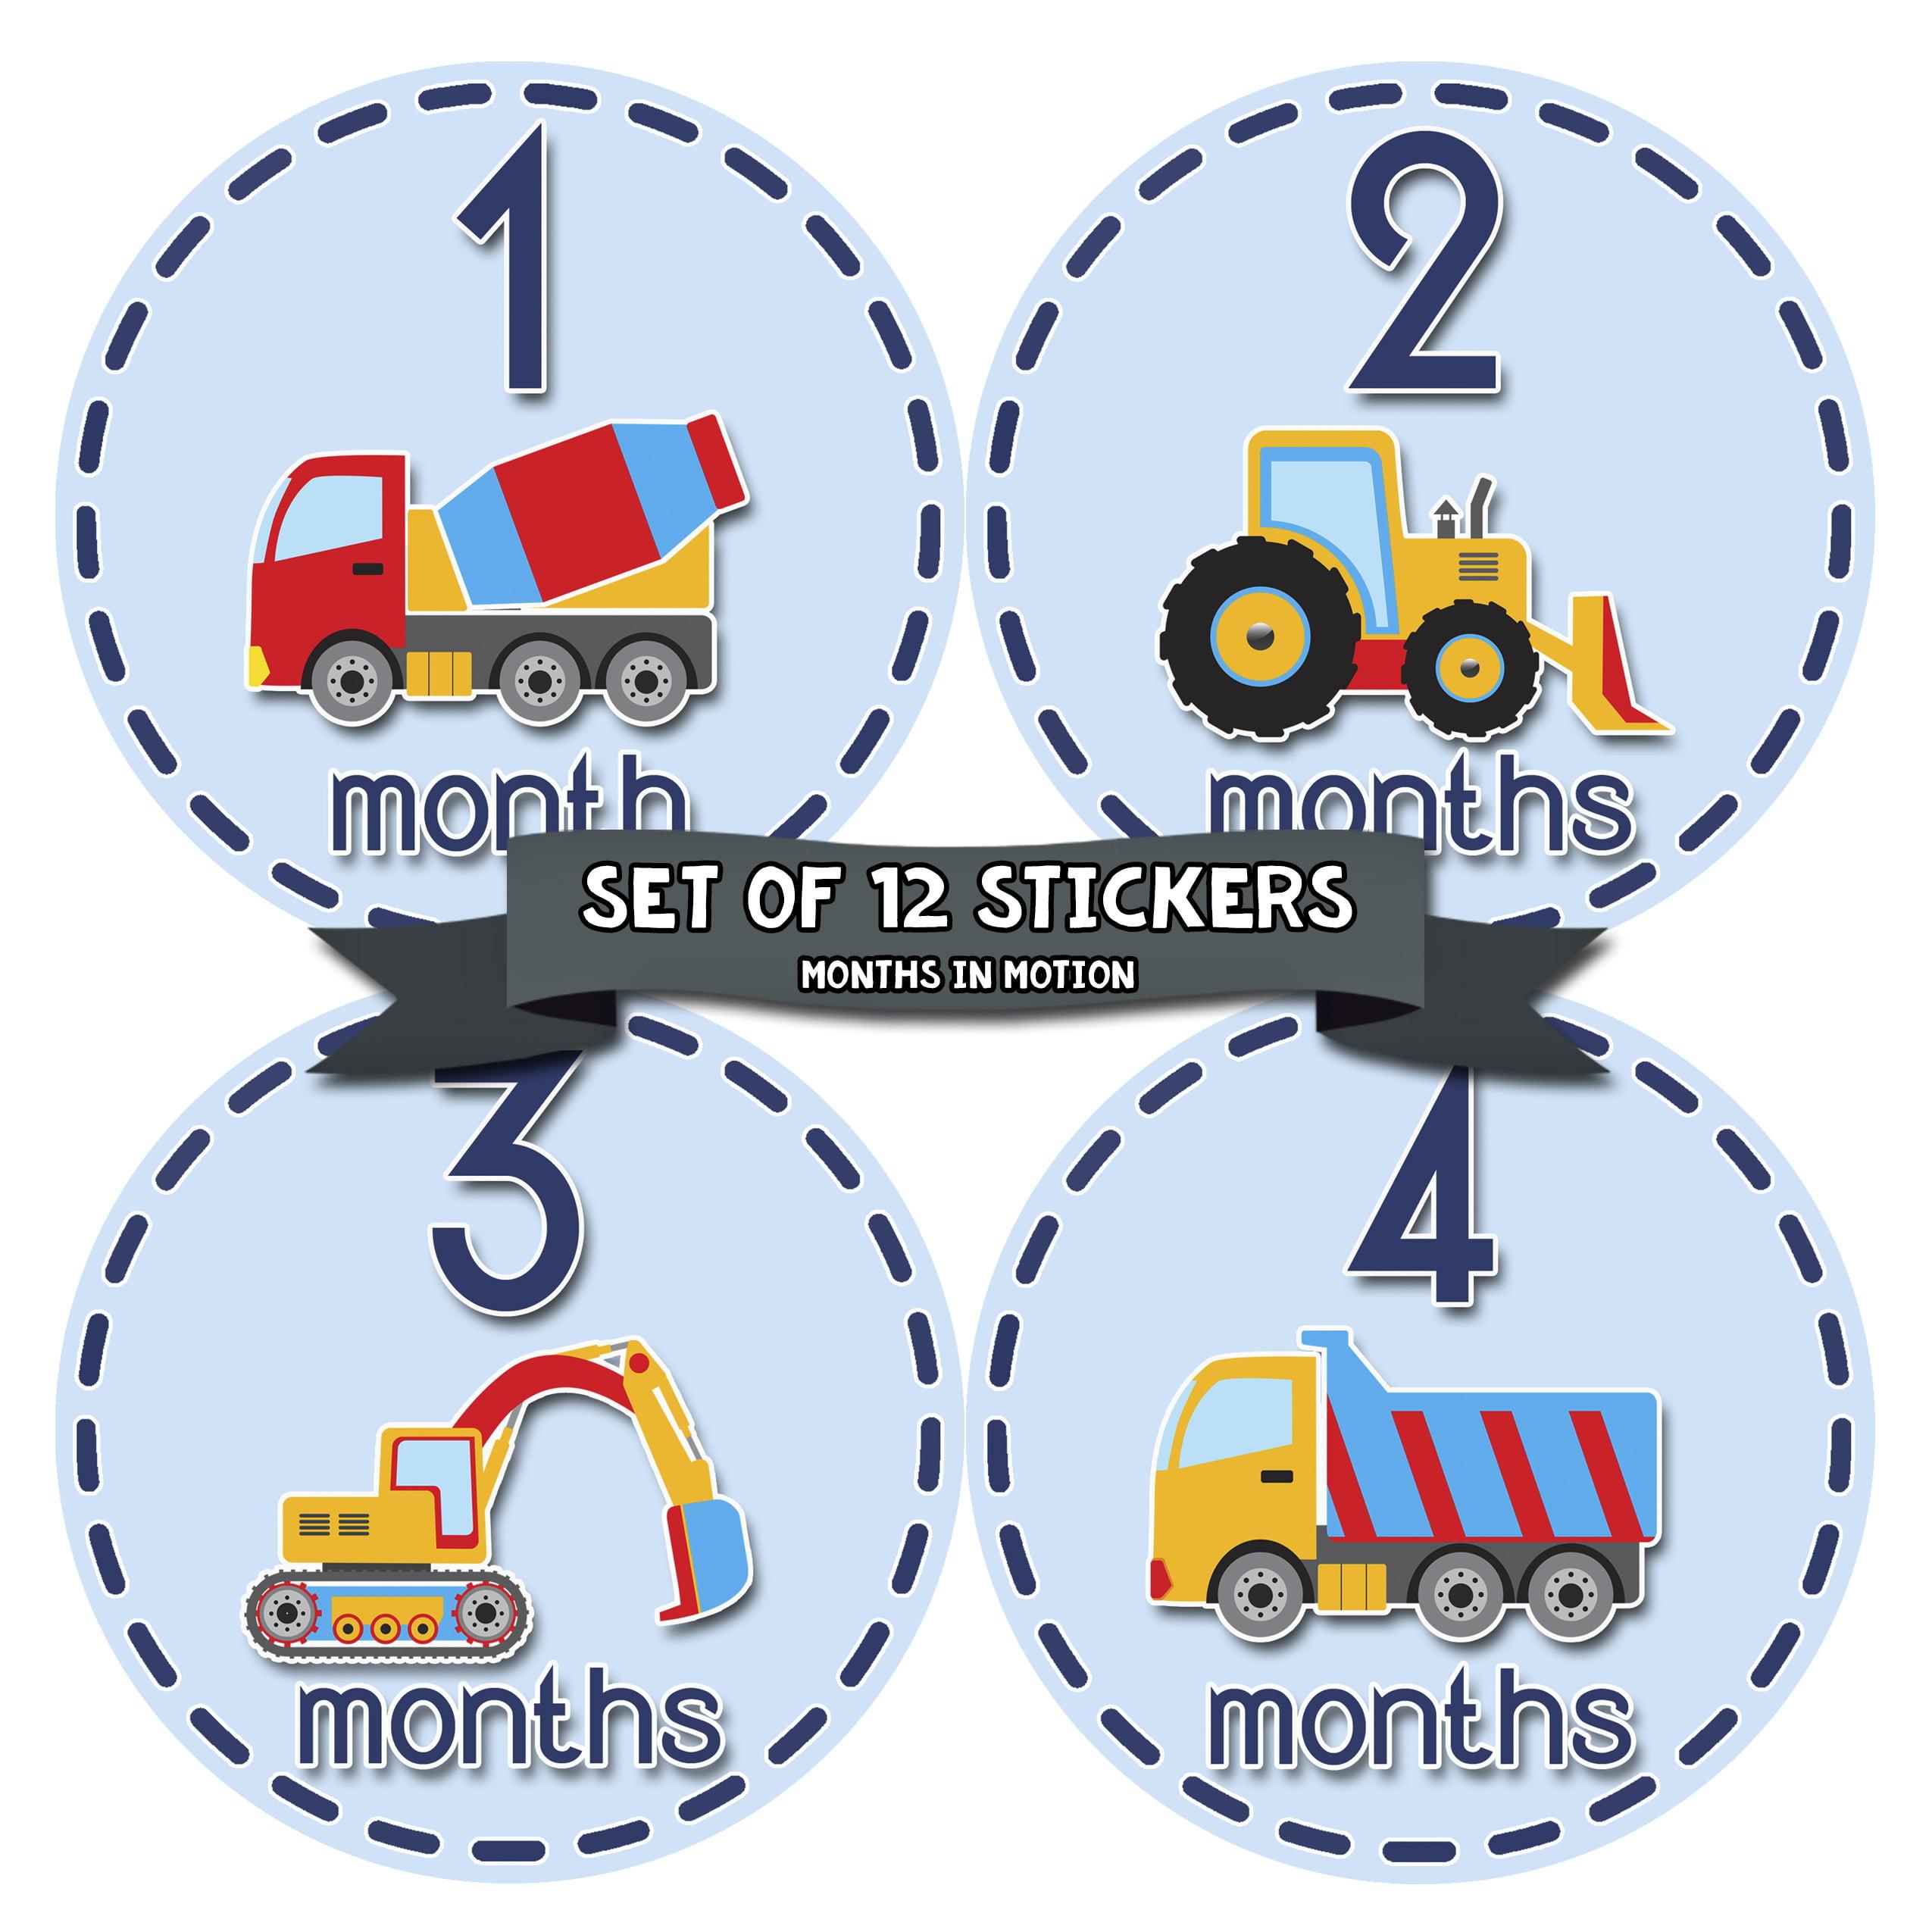 Months in Motion 810 Monthly Baby Stickers Construction Trucks Baby Boy Month 1-12 Milestone Age Sticker Photo Prop